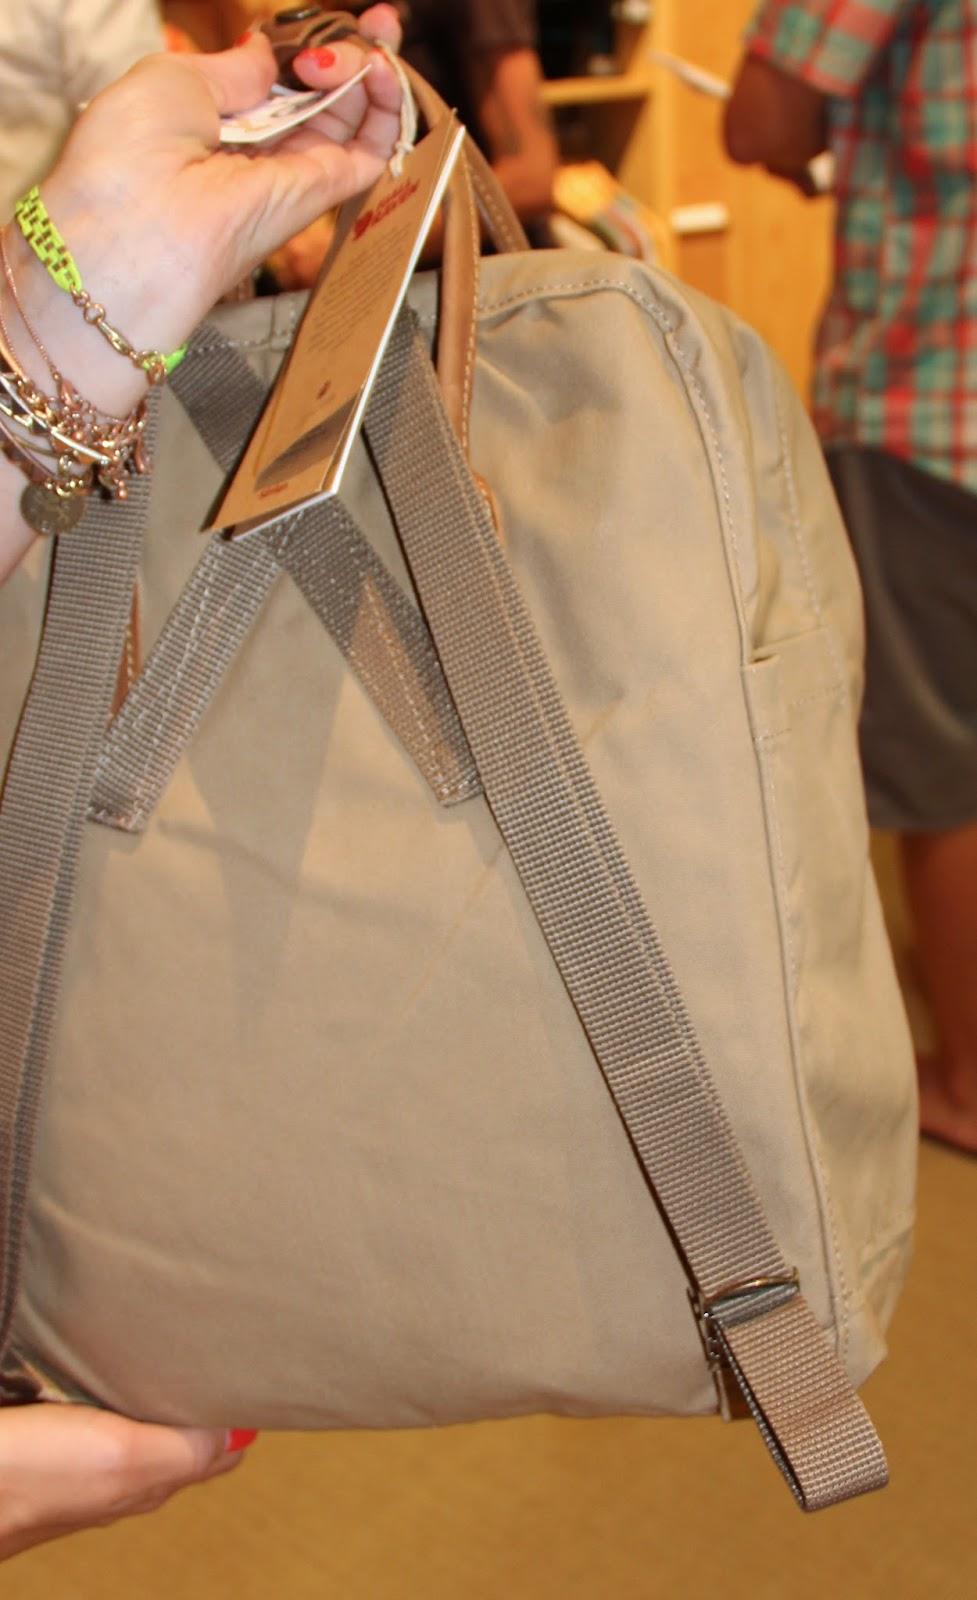 kanken how to adjust straps